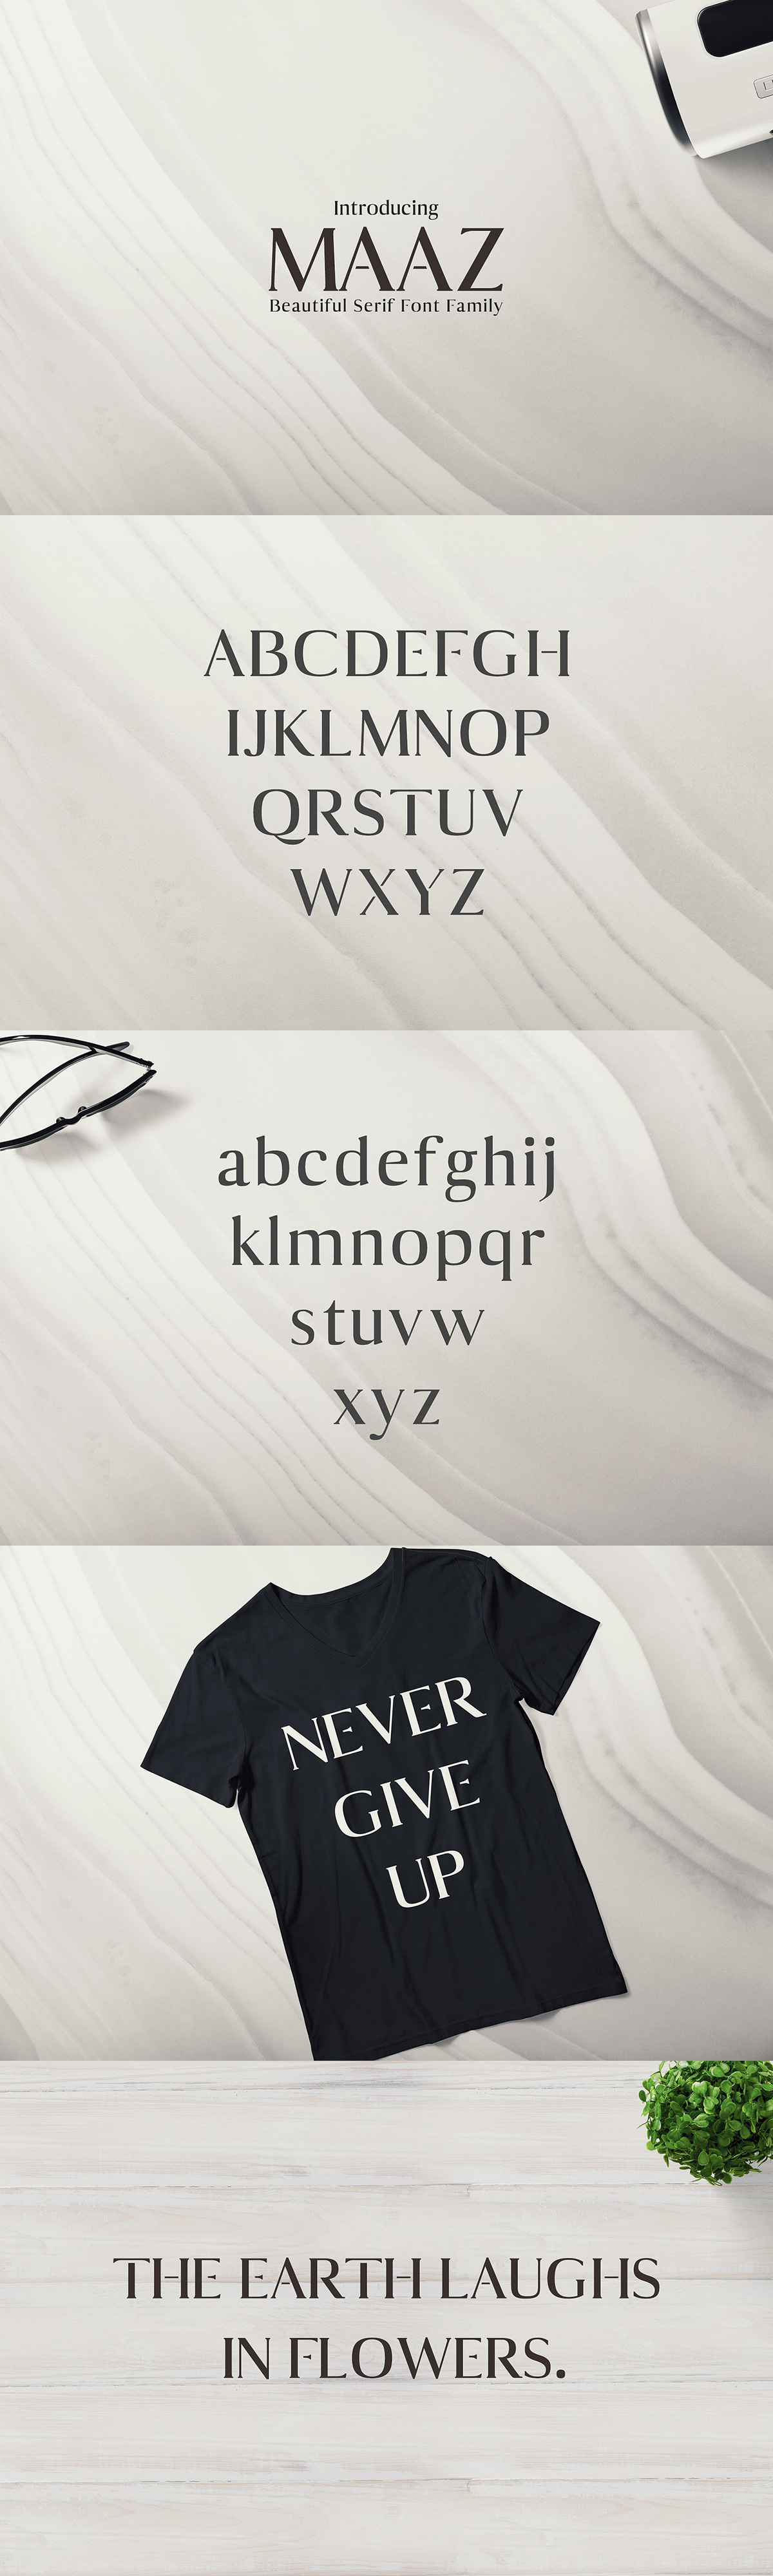 Maaz Serif 6 Fonts Family Pack